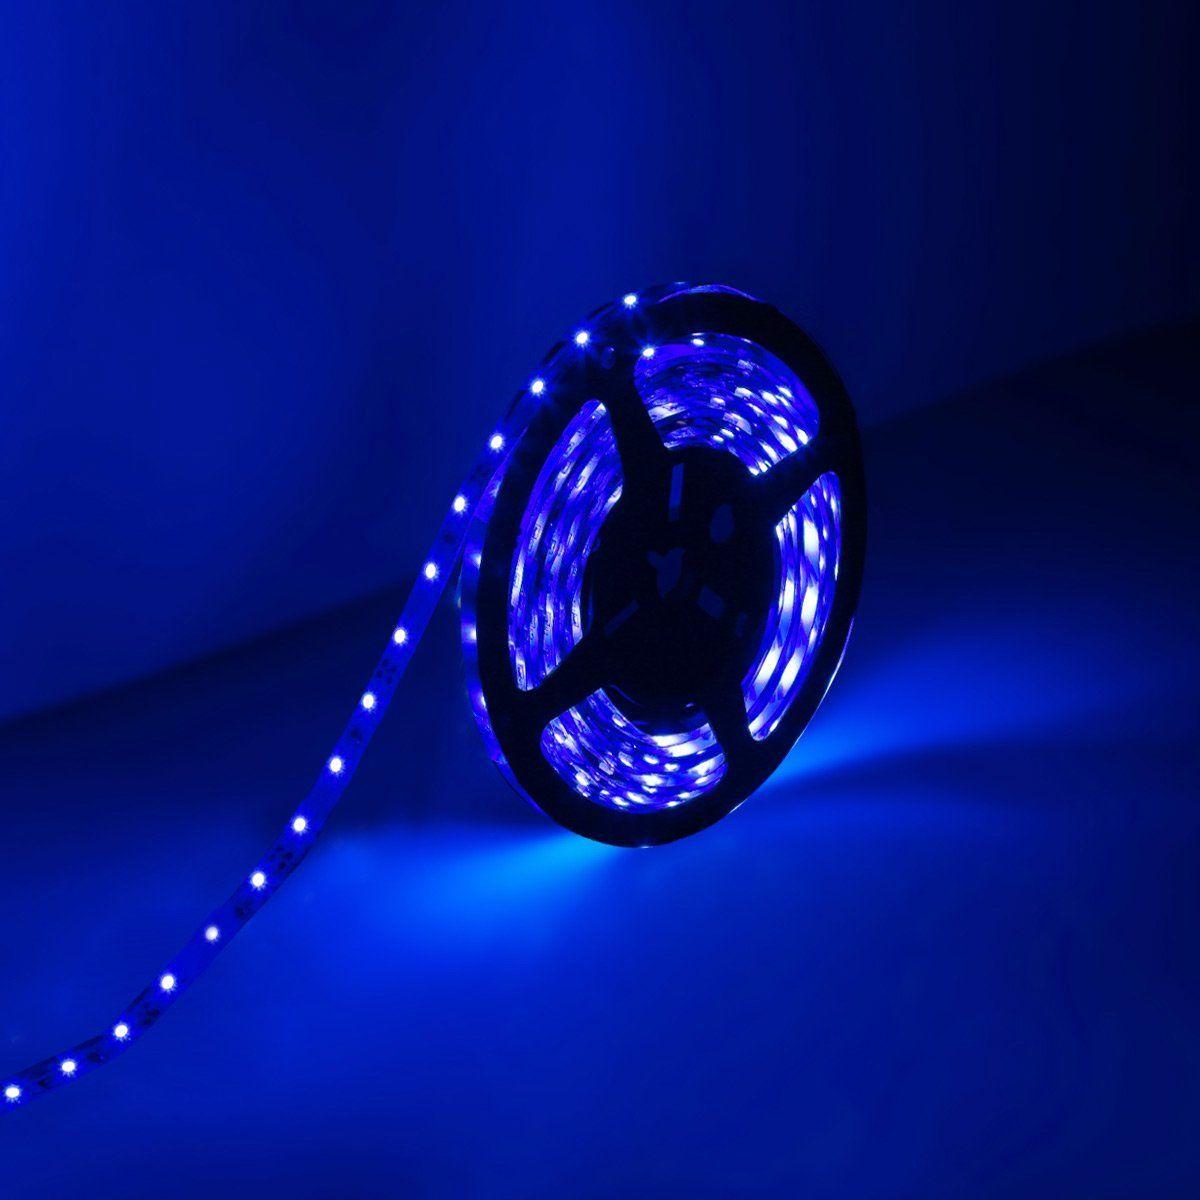 Amazon le lampux 12v flexible led strip lights led tape blue le 164ft5m flexible led light strips 300 units smd 3528 leds 12v dc led strip lights blue non waterproof lighting strips led tape for aloadofball Image collections